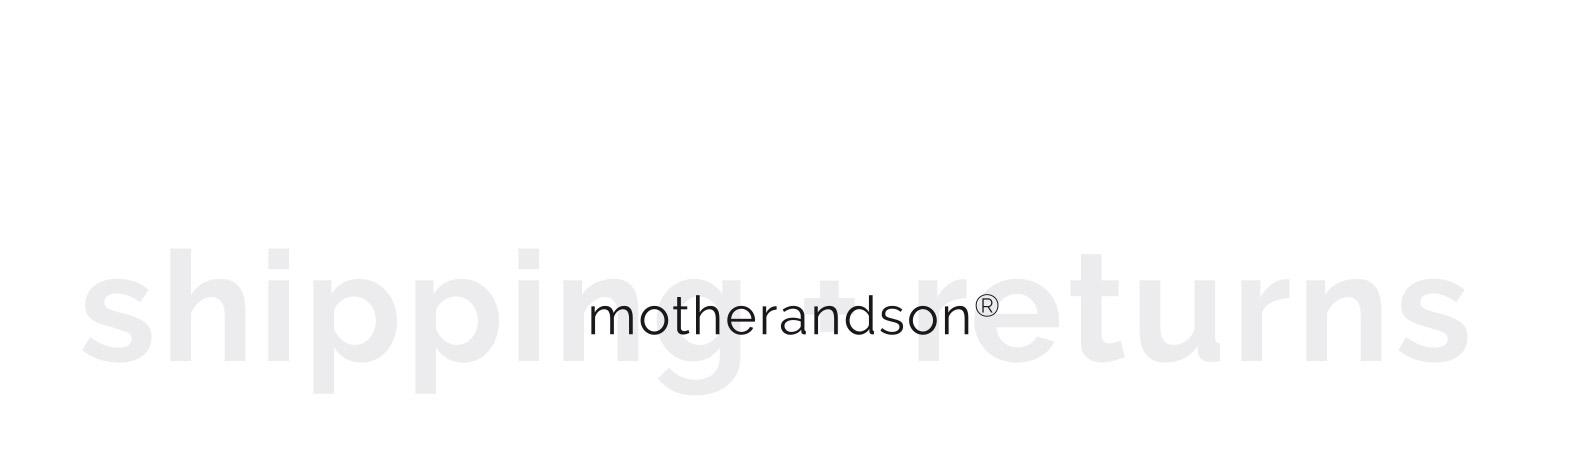 Shipping Returns Motherandson